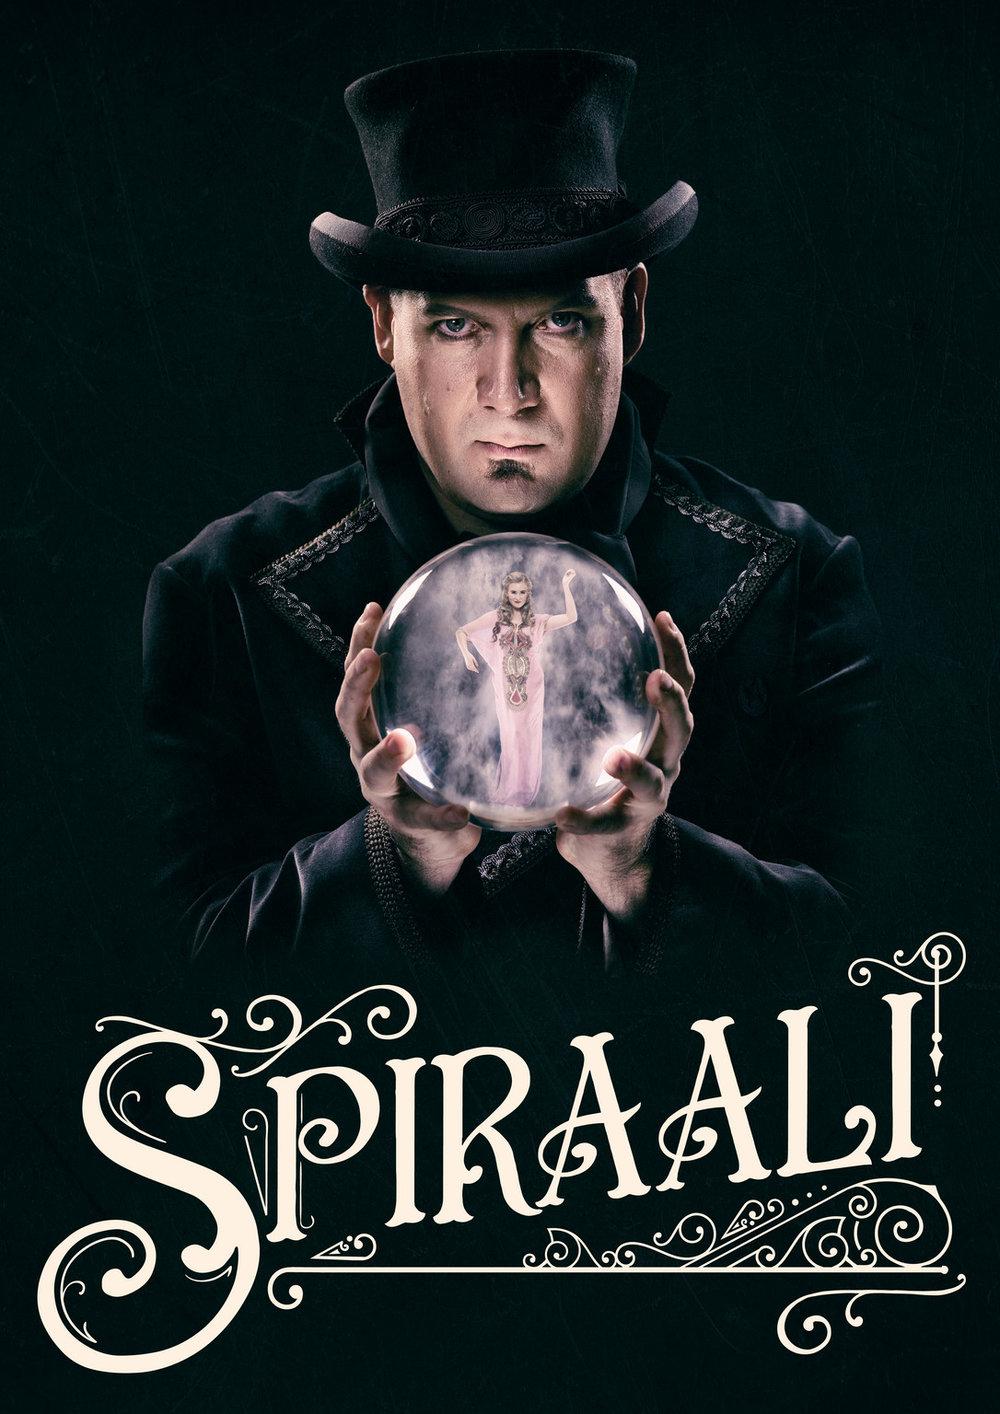 Spiraali_Tampereenteatteri